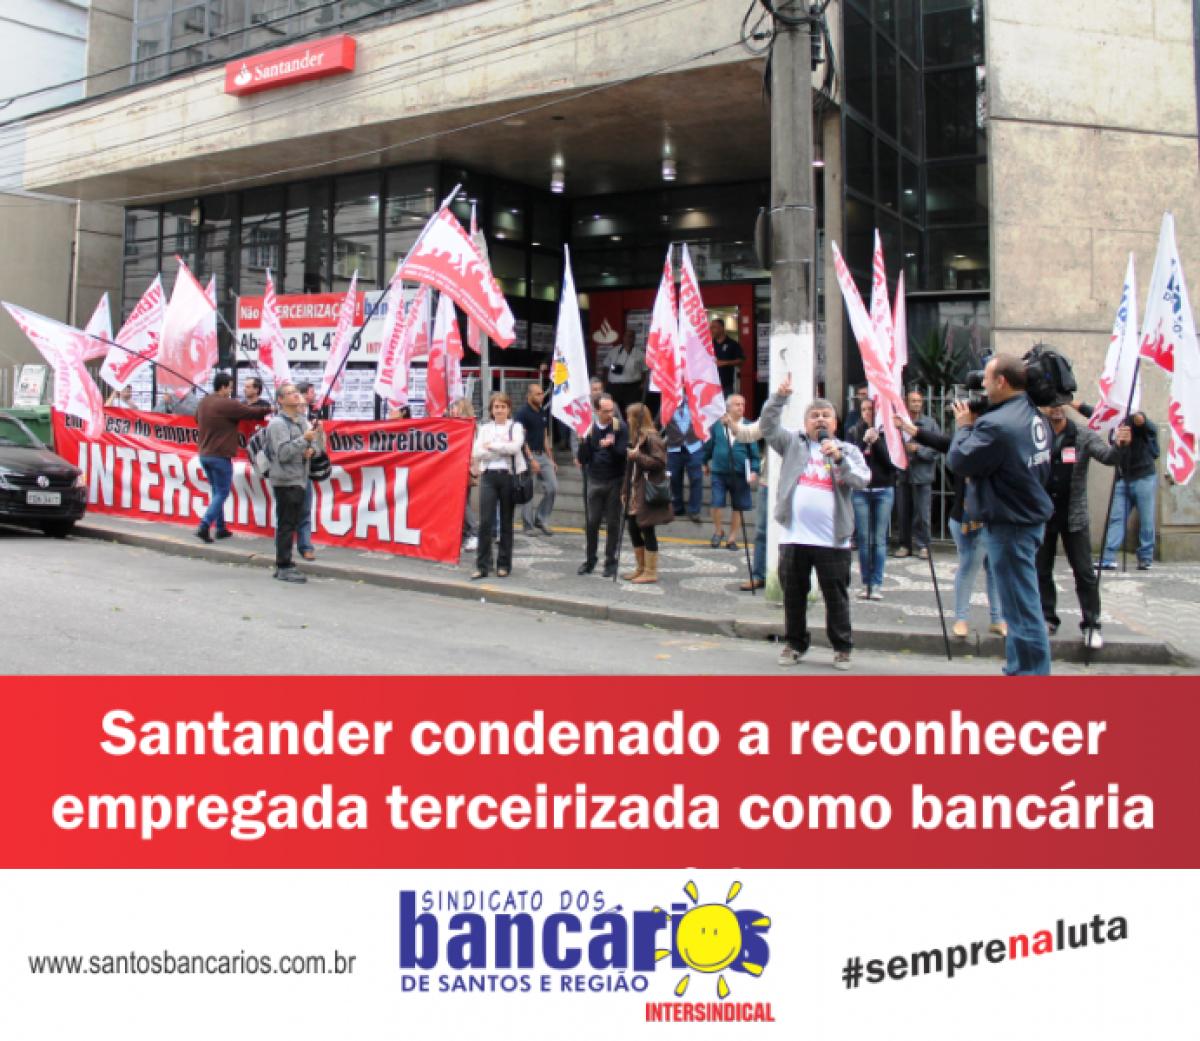 Santander condenado a reconhecer empregada terceirizada como bancária